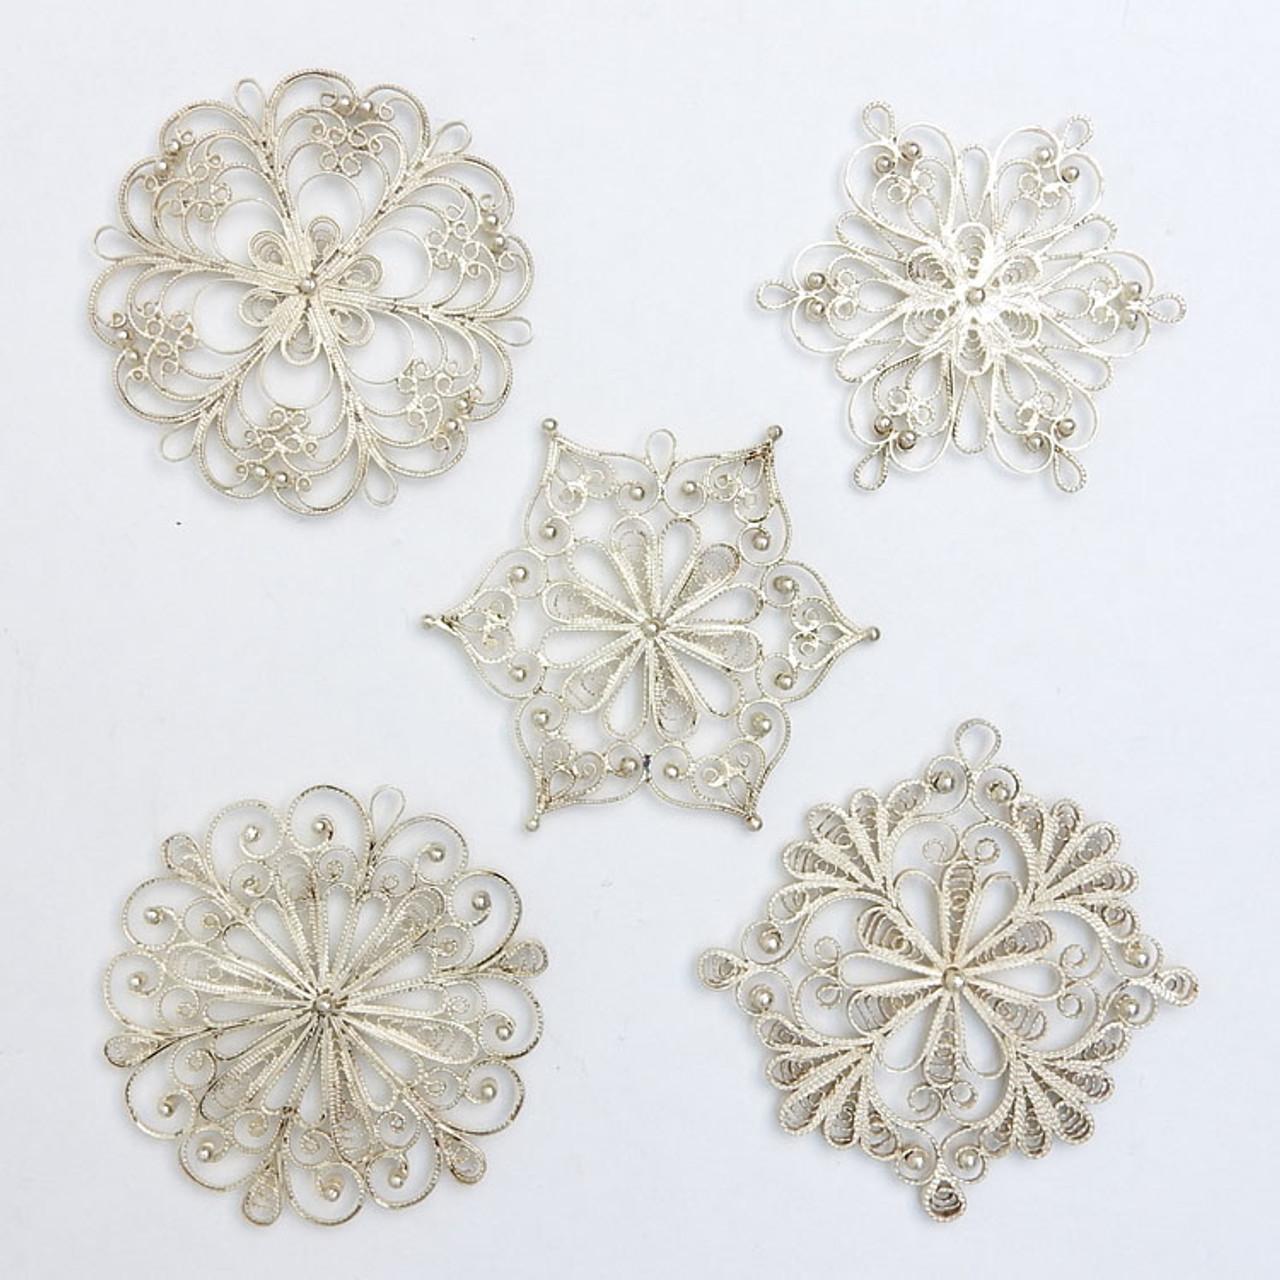 """Снежинка"" (SnowFlake) Russian Filigree Christmas Ornaments"